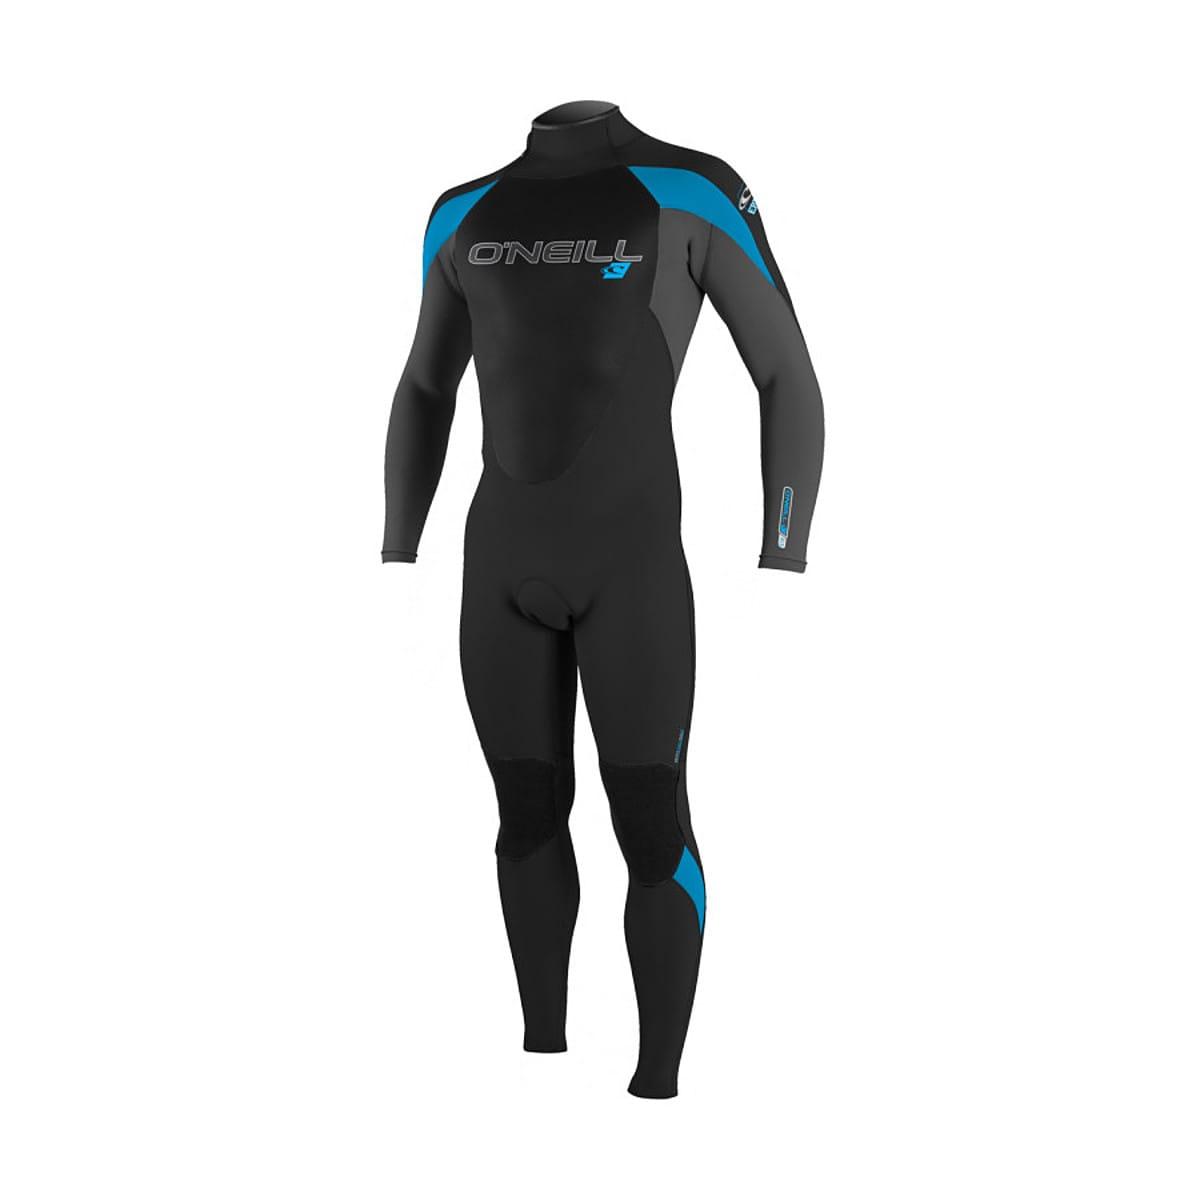 Epic 3/2mm Back-Zip Full Wetsuit - Men